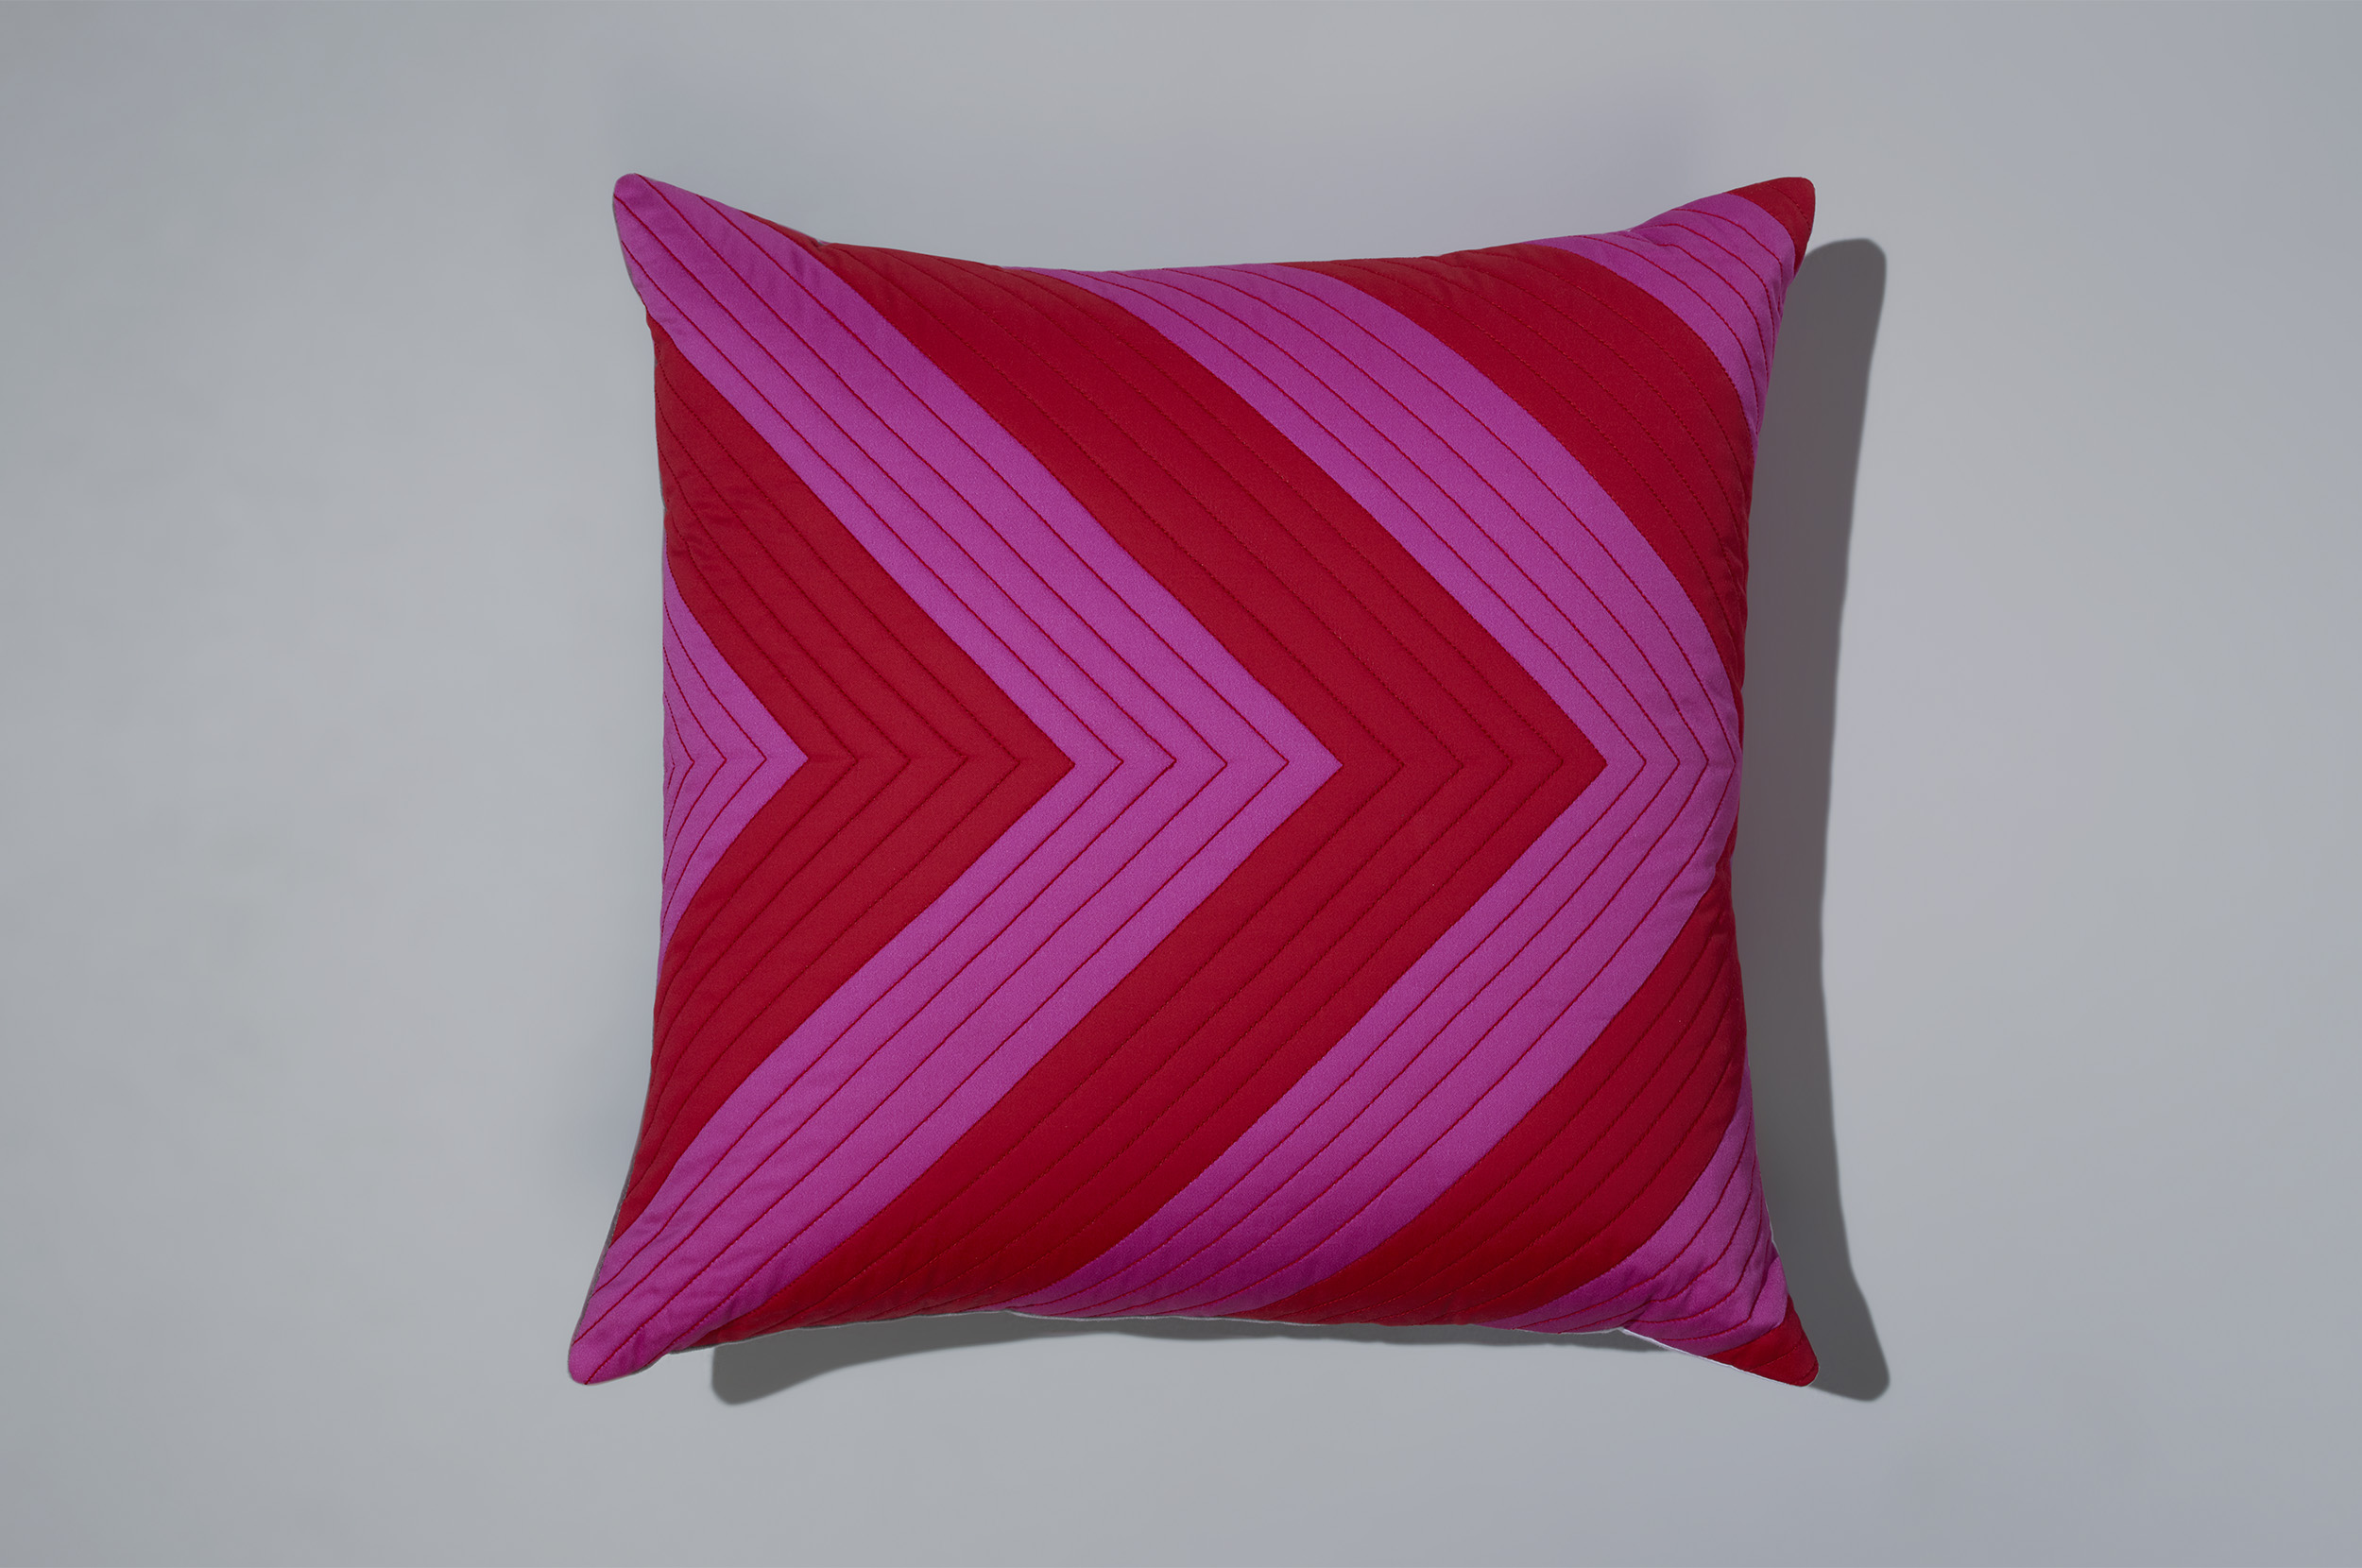 PostAndGleam_Pillows_RedPinkChevron_COMP_Oa_FL2500.JPG